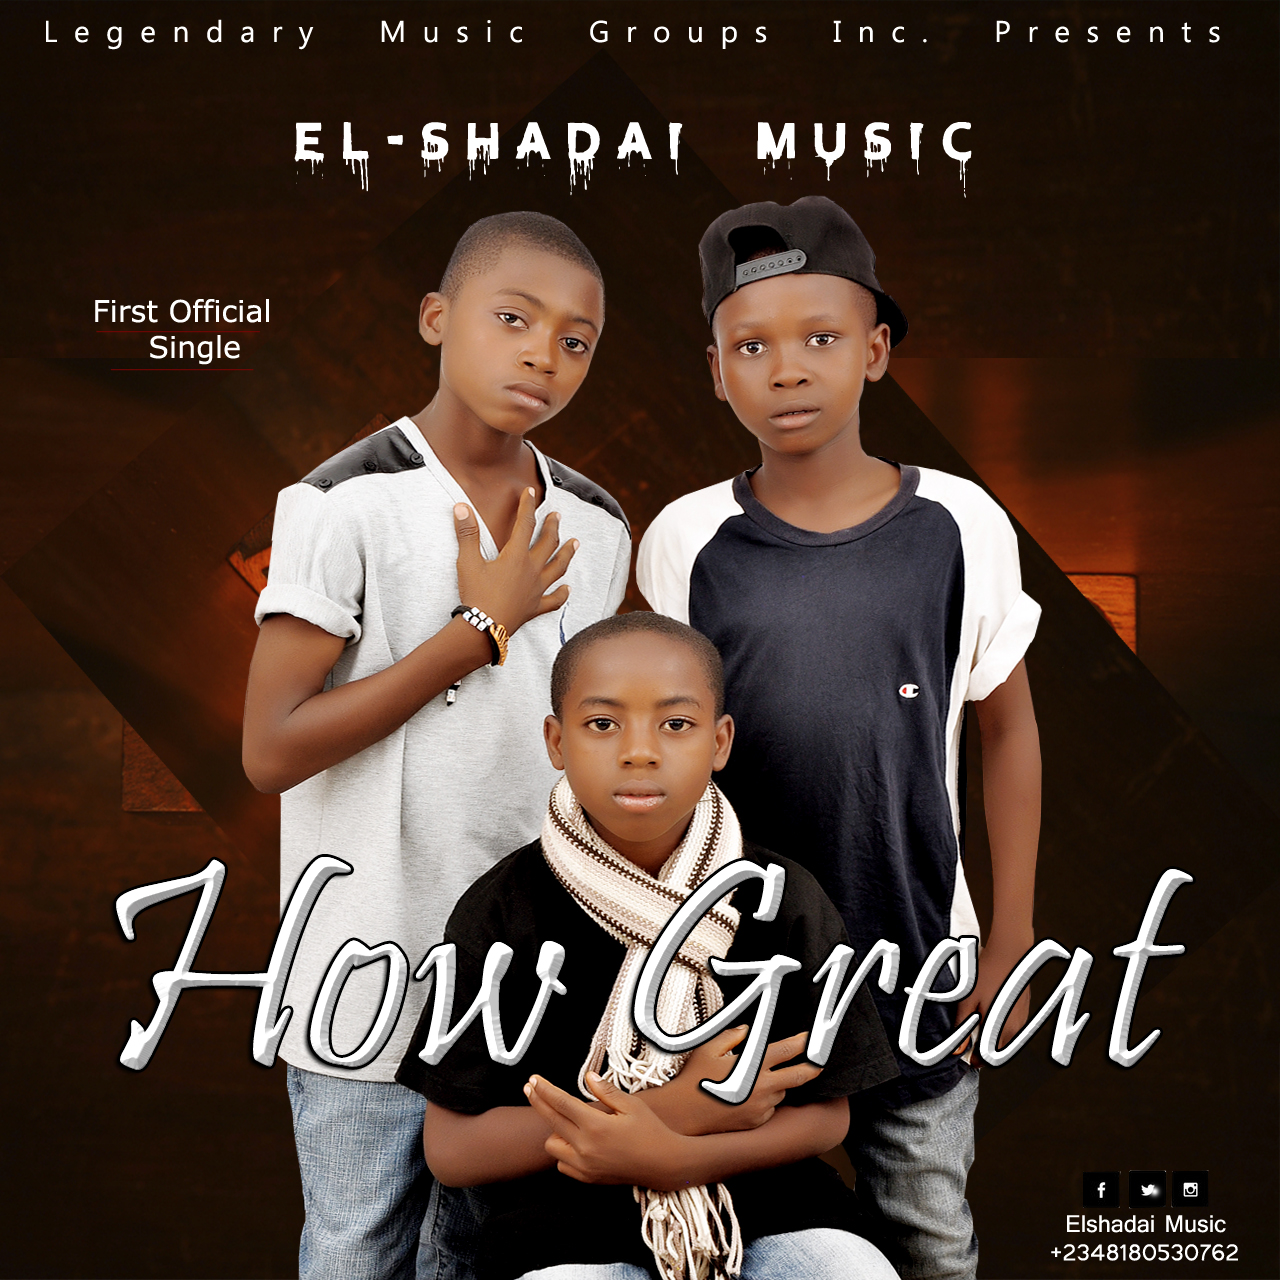 El-shadai Music